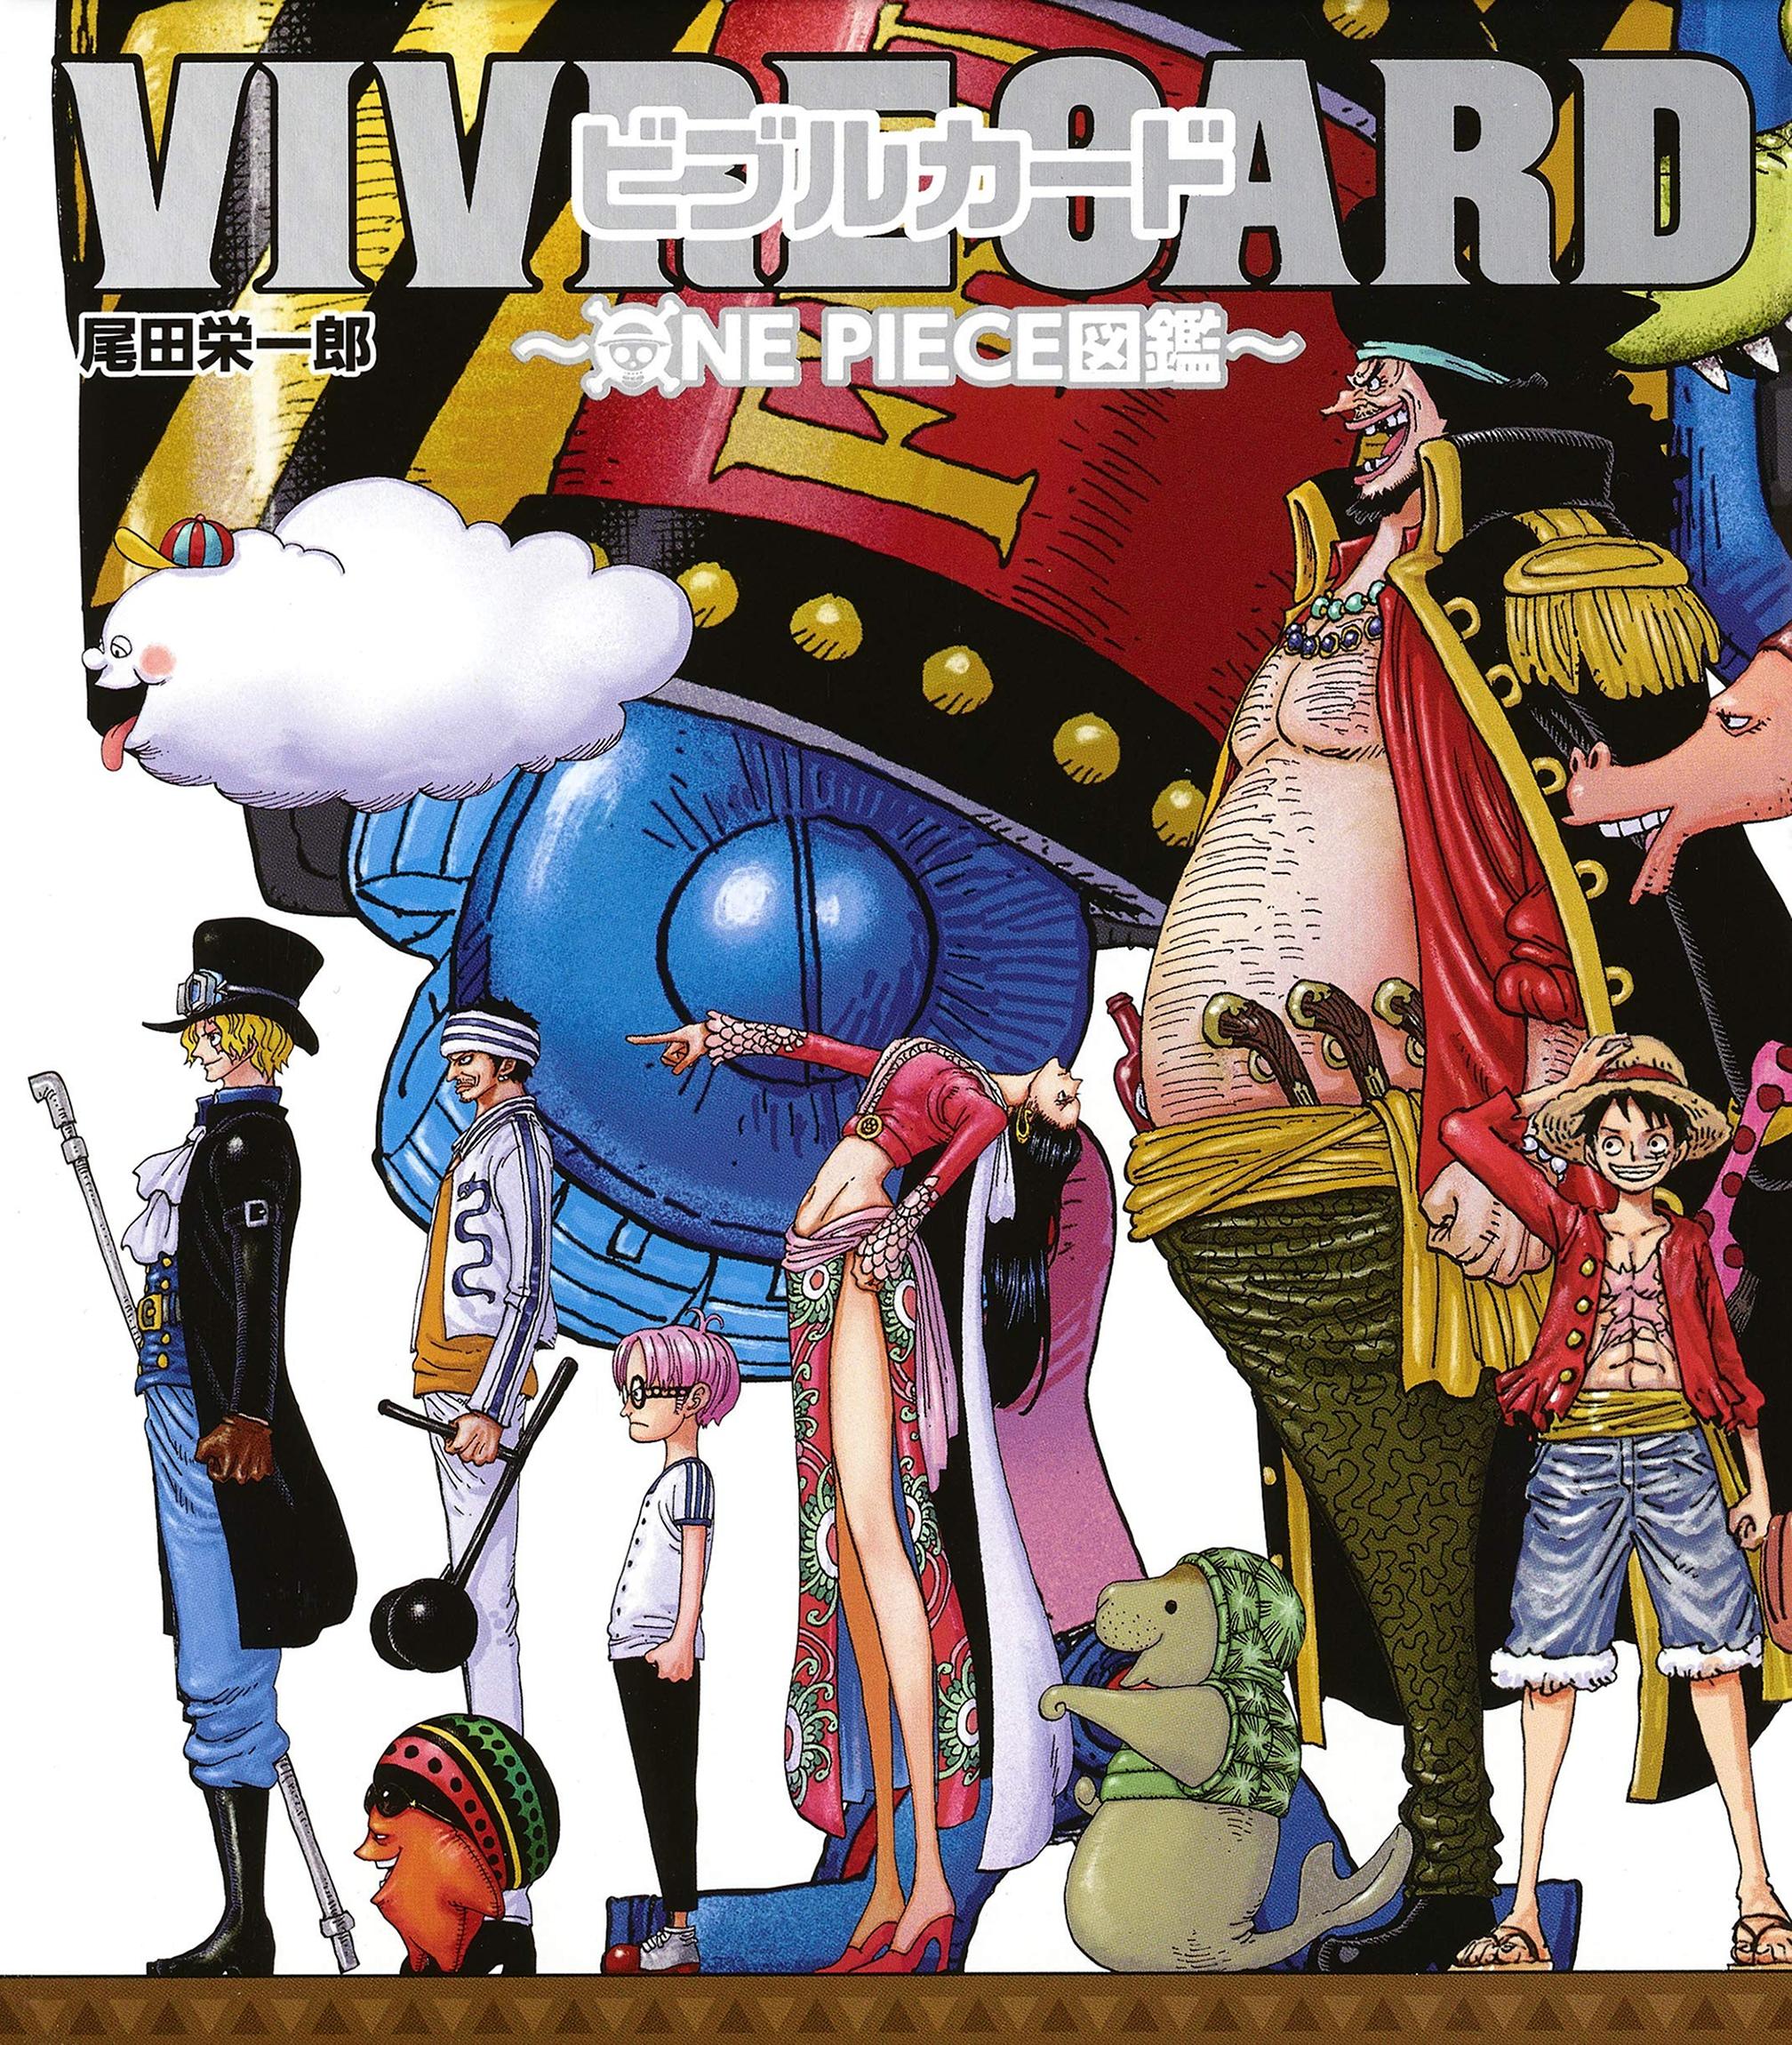 Fanbuch Vivre Card Vivre_Card_-_One_Piece_Visual_Dictionary_2